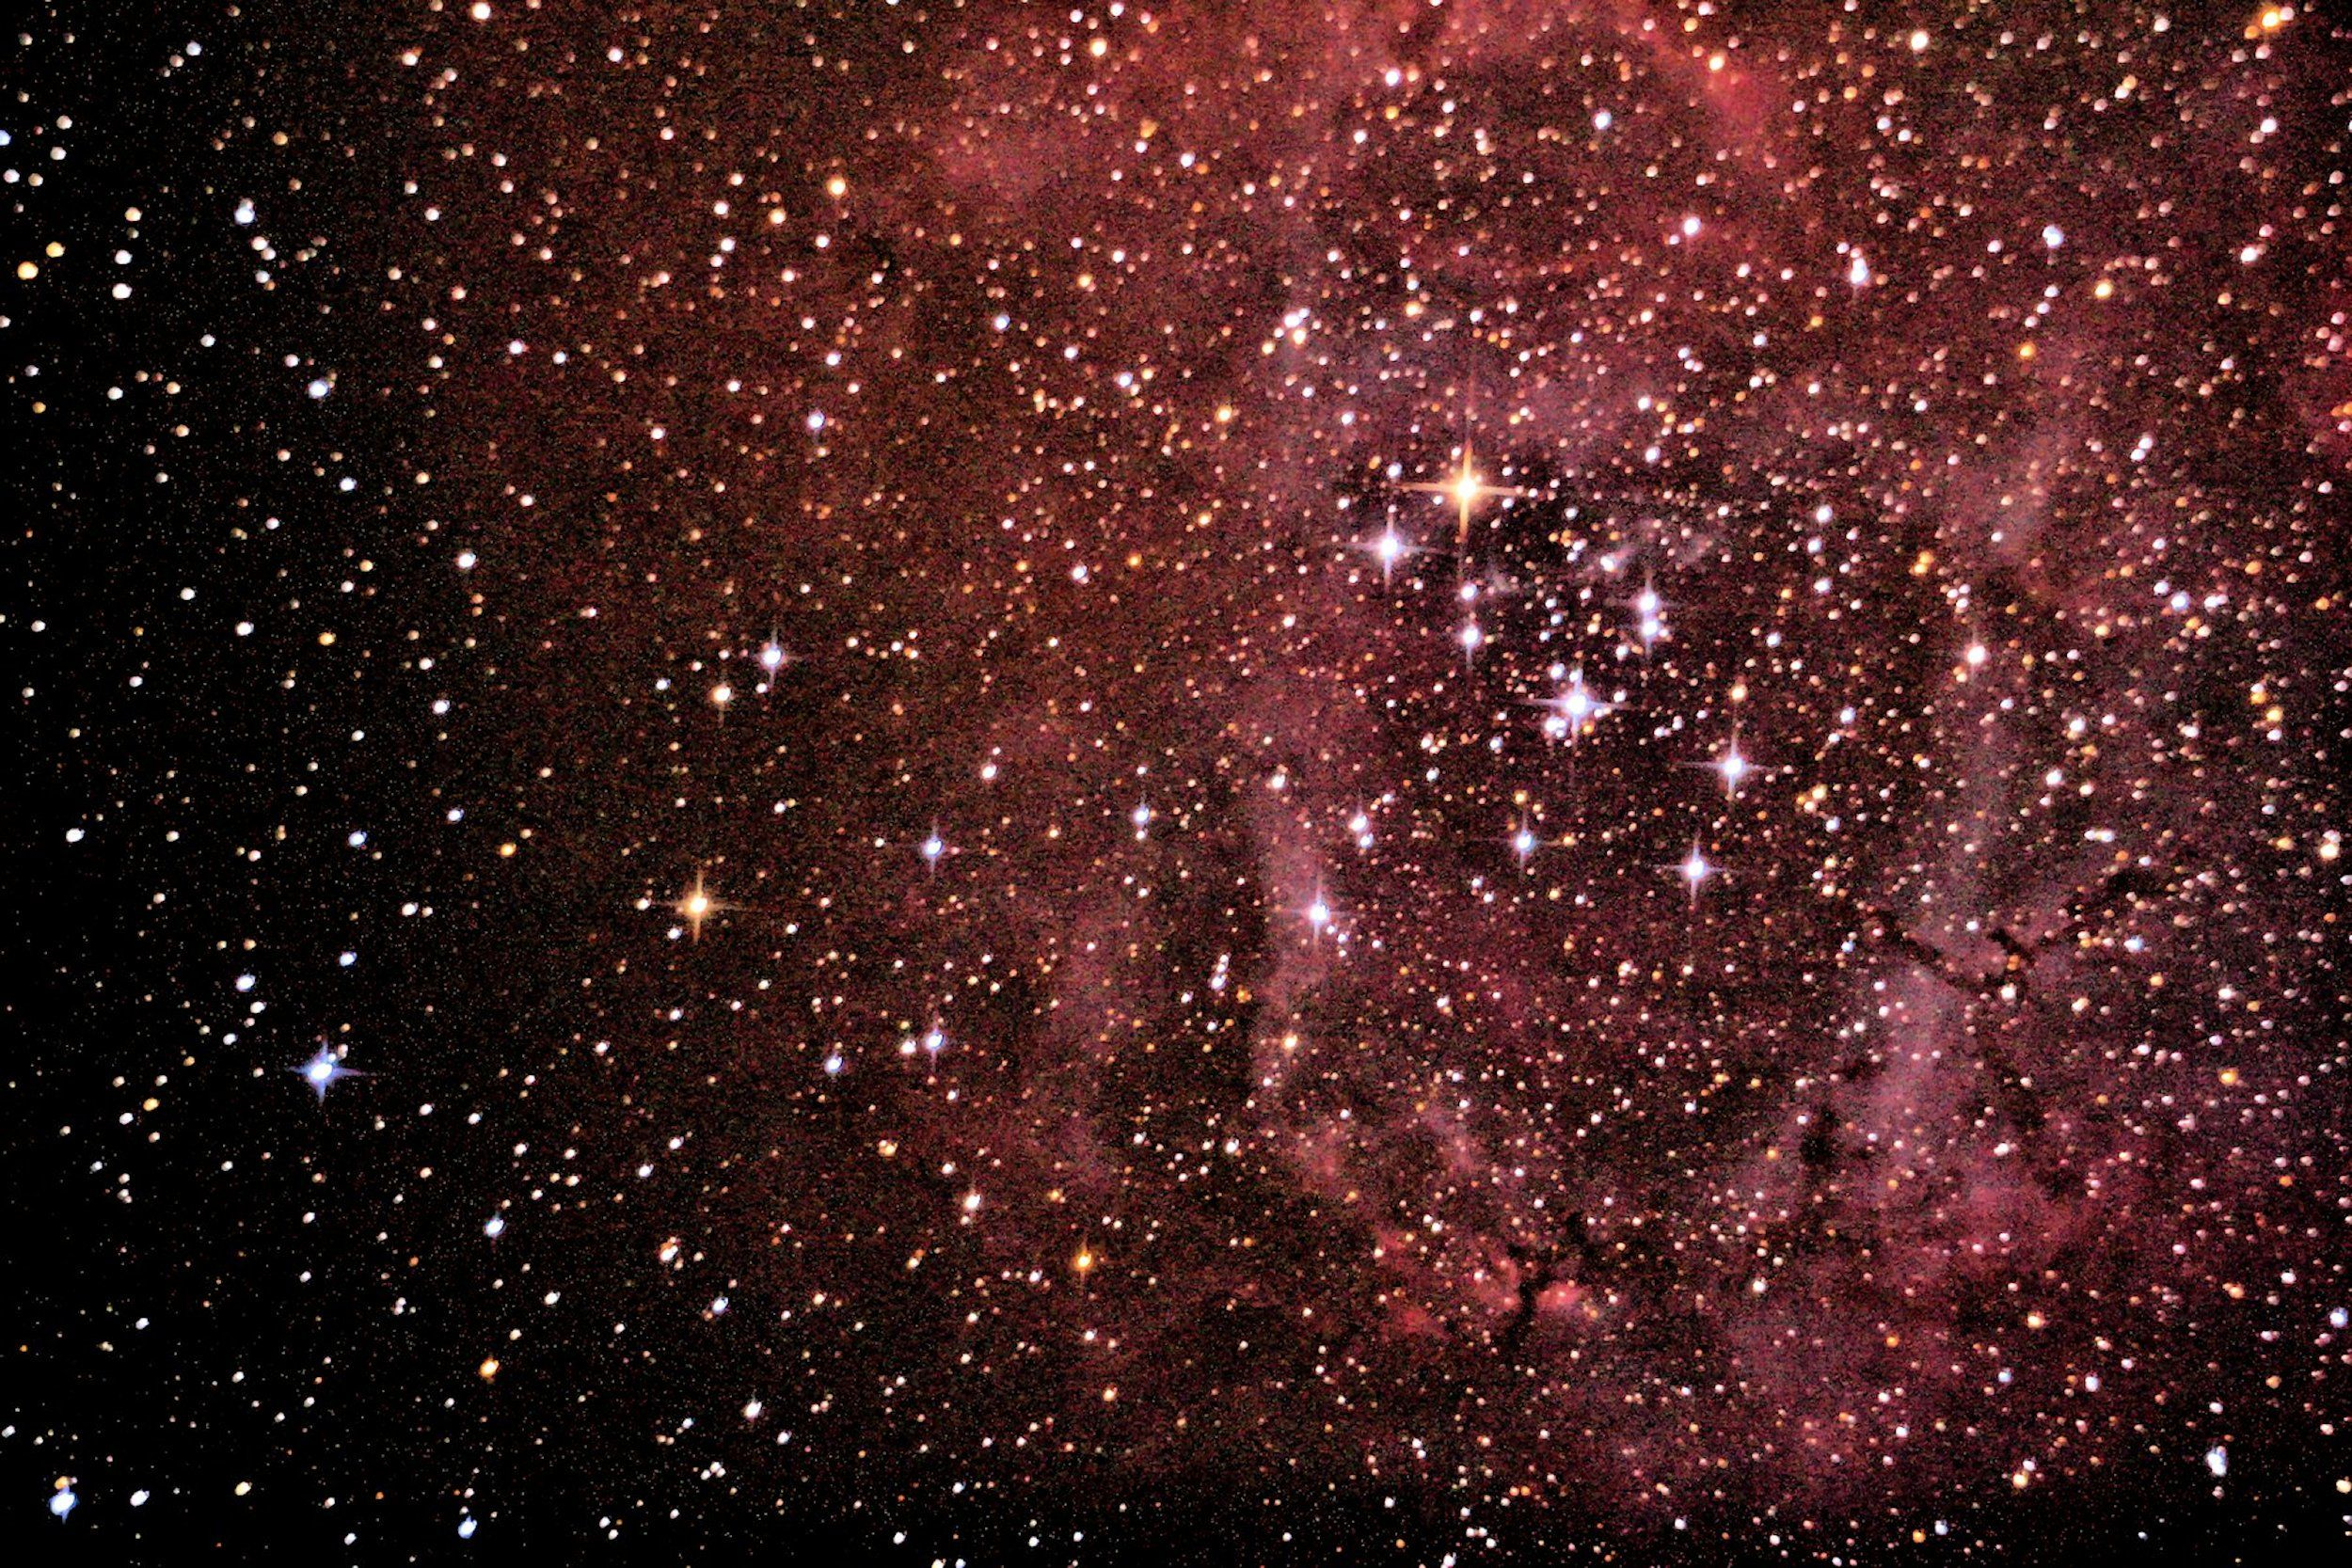 Rosette Nebula 11-28-13